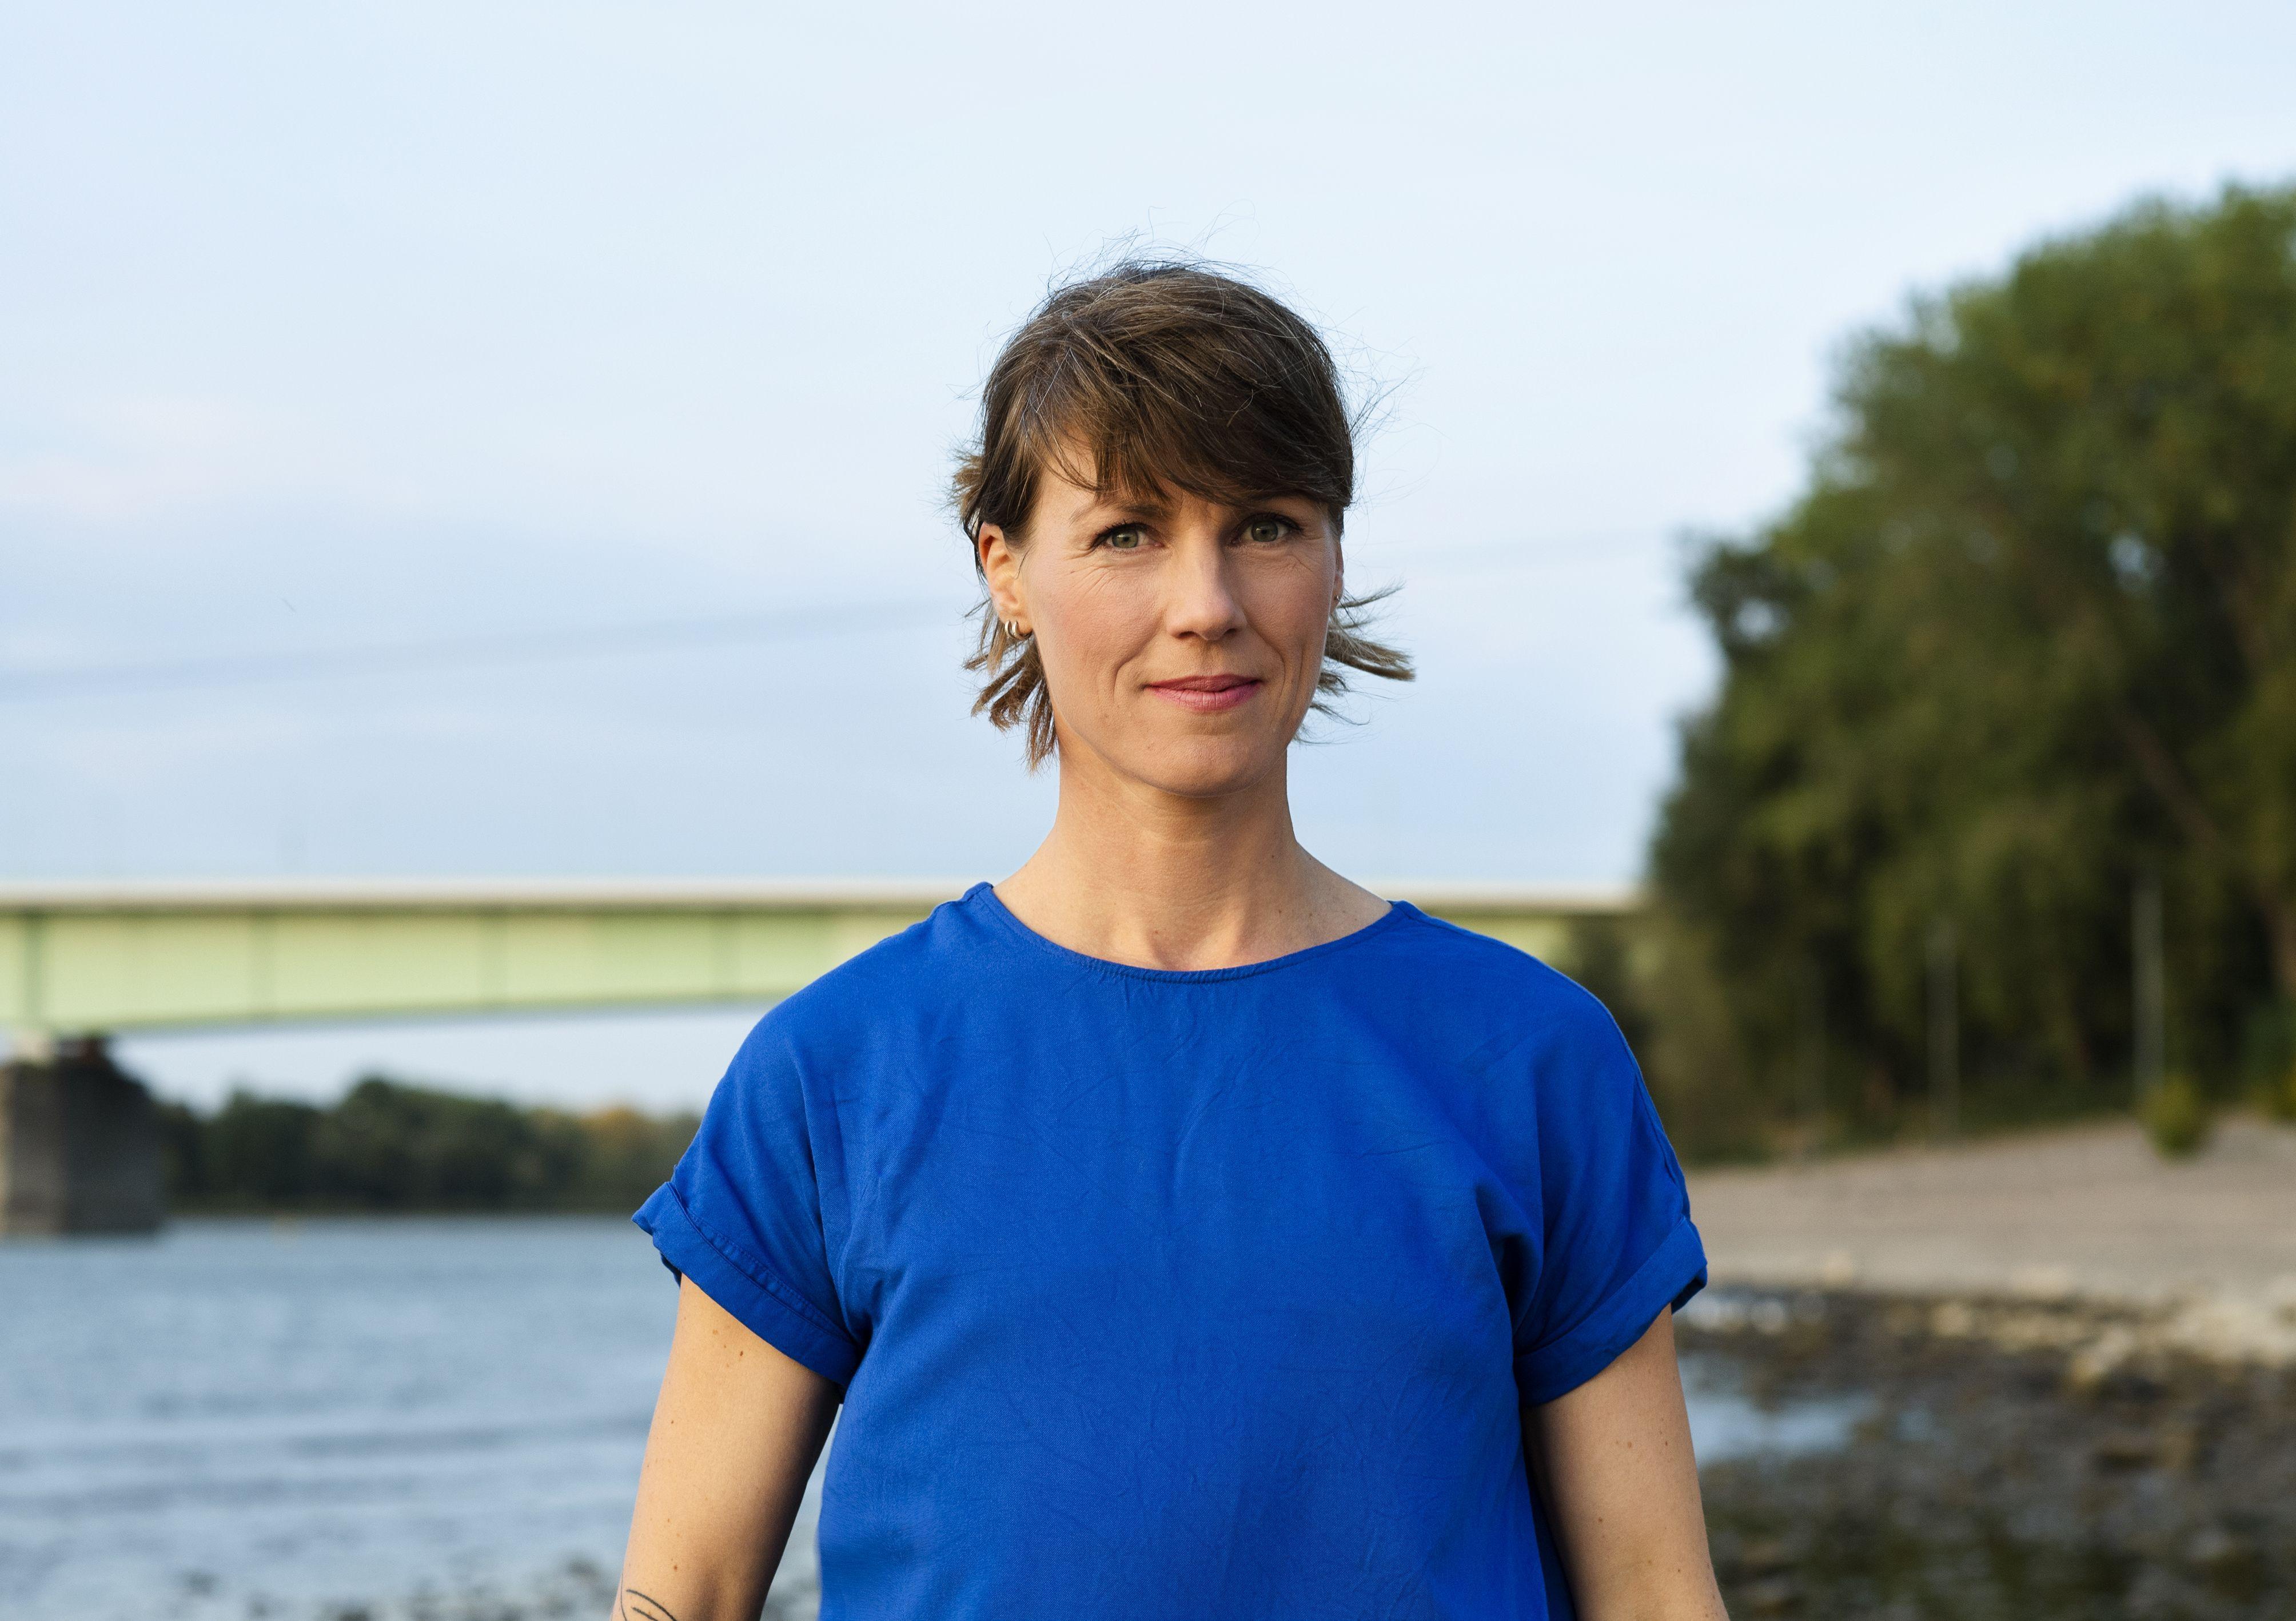 Die Autorin Nora Hespers, ©Annette Etges/Suhrkamp Verlag